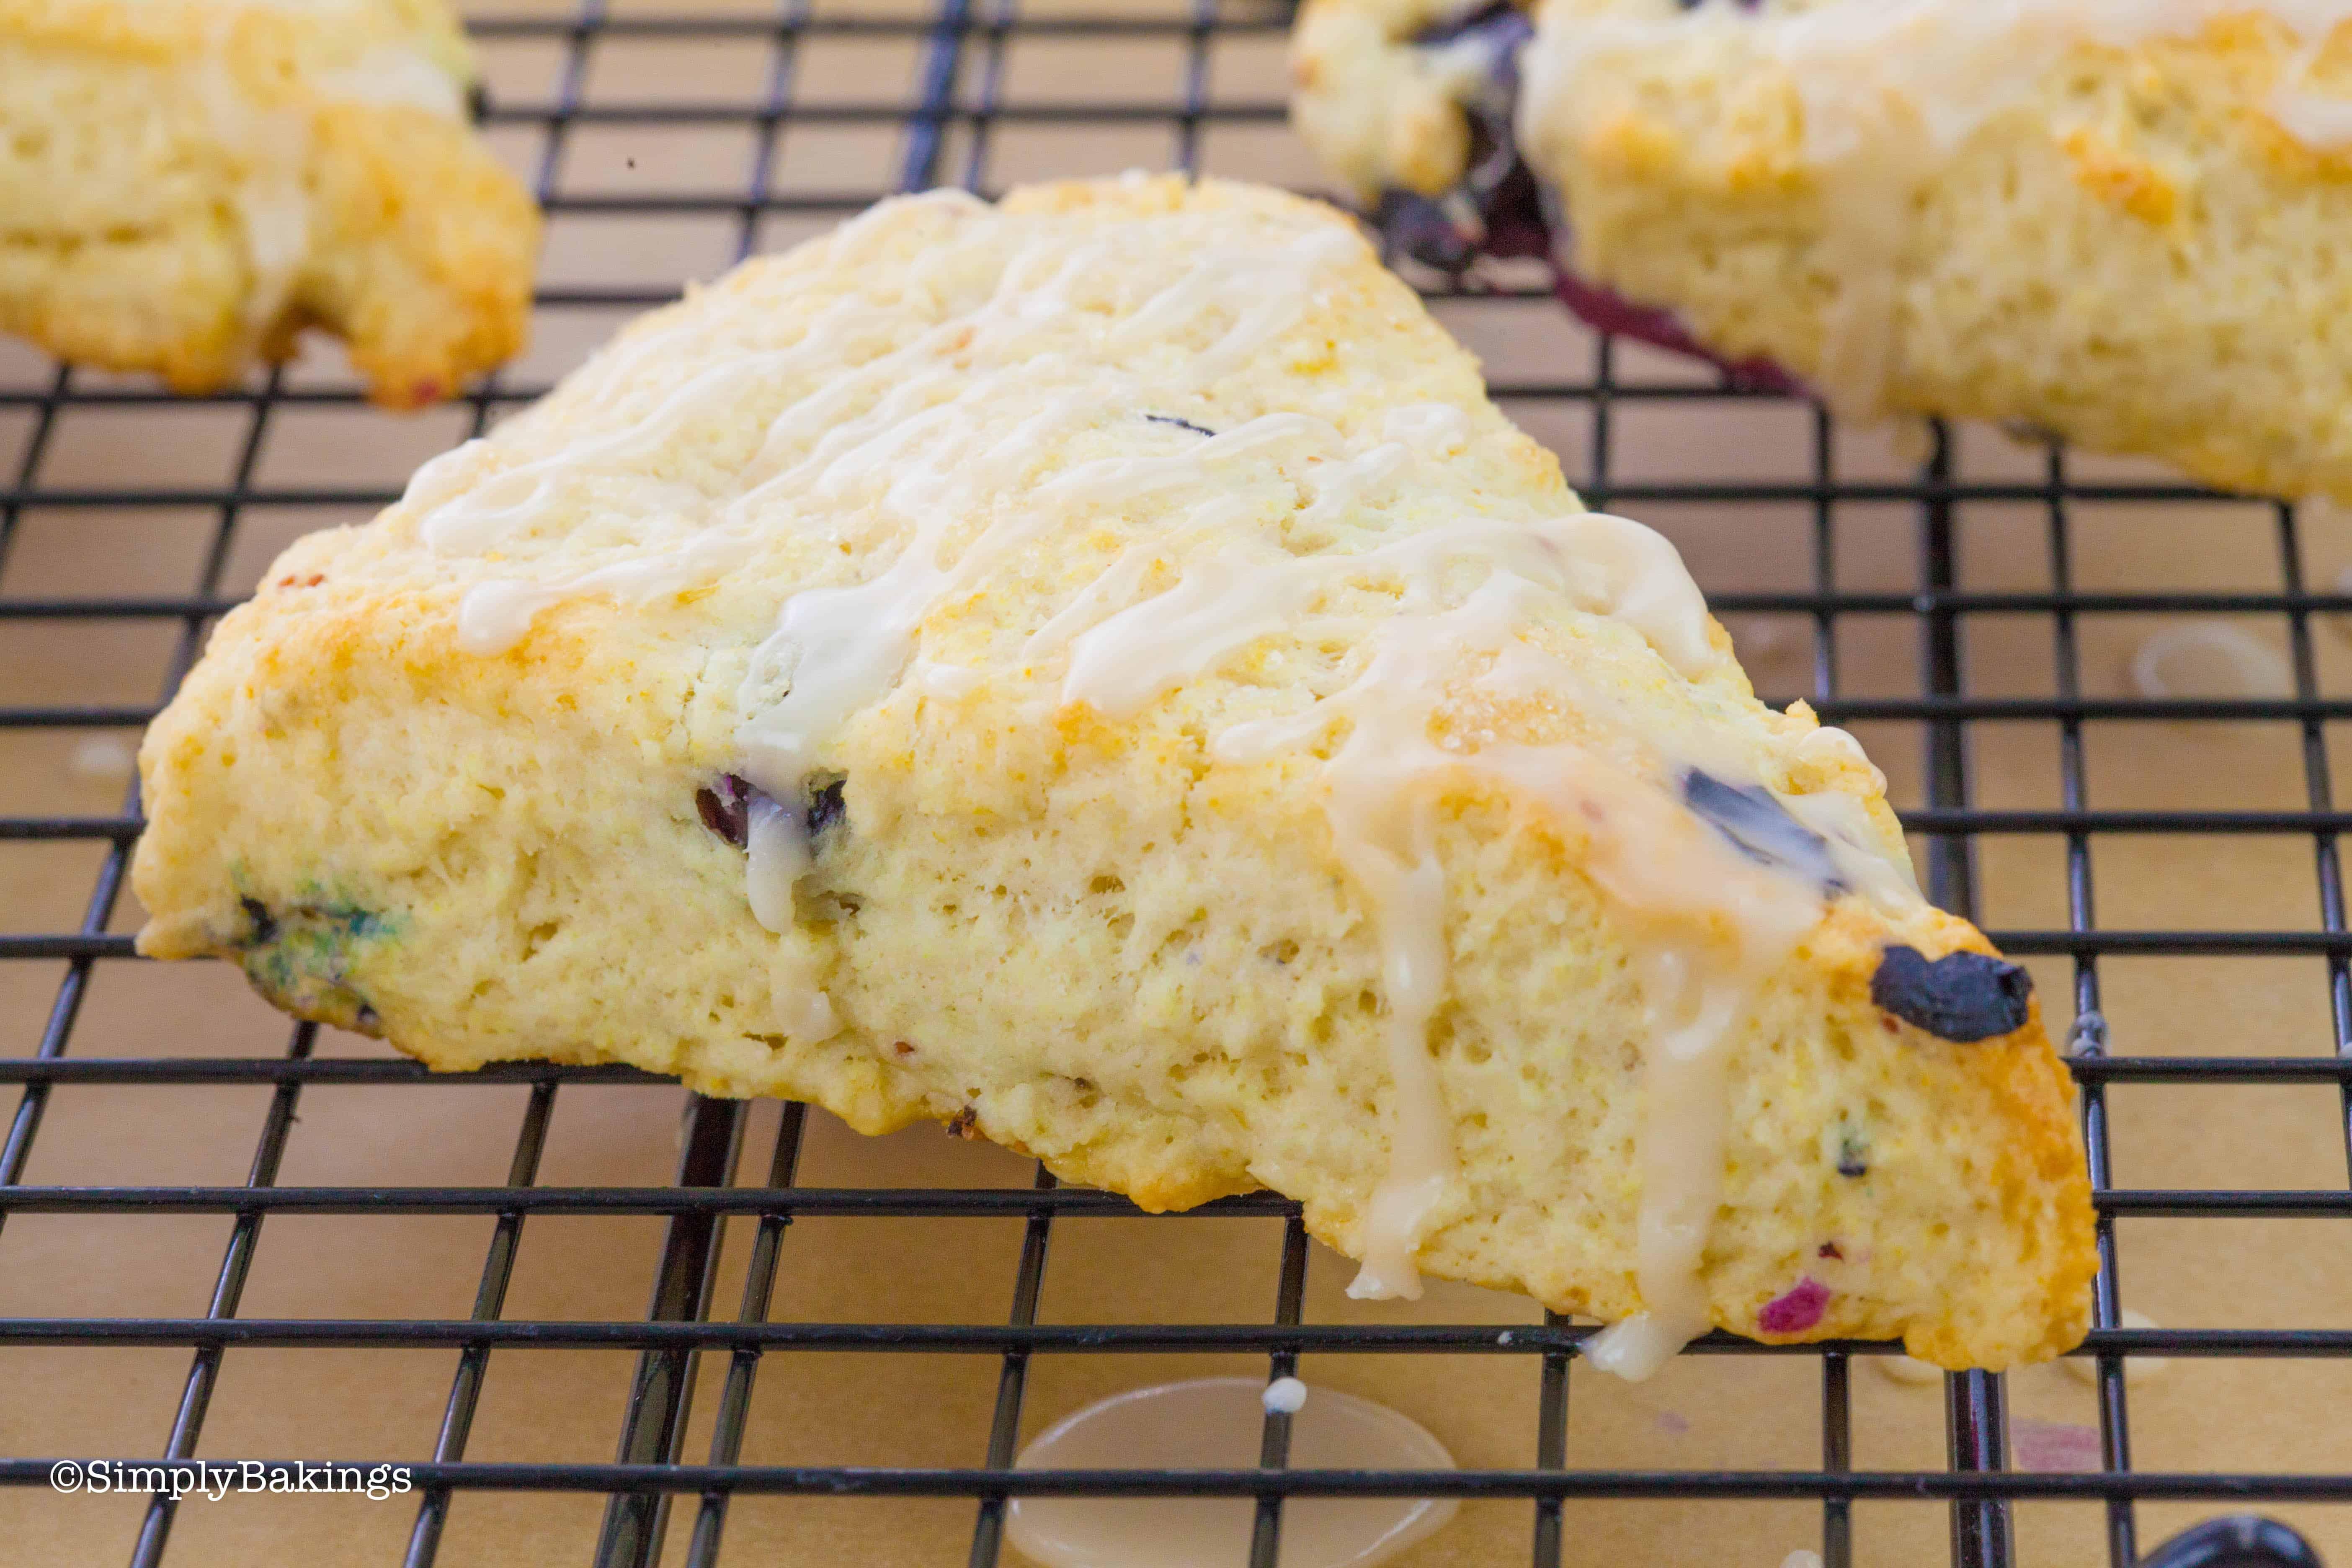 blueberry scone drizzled with lemon glaze